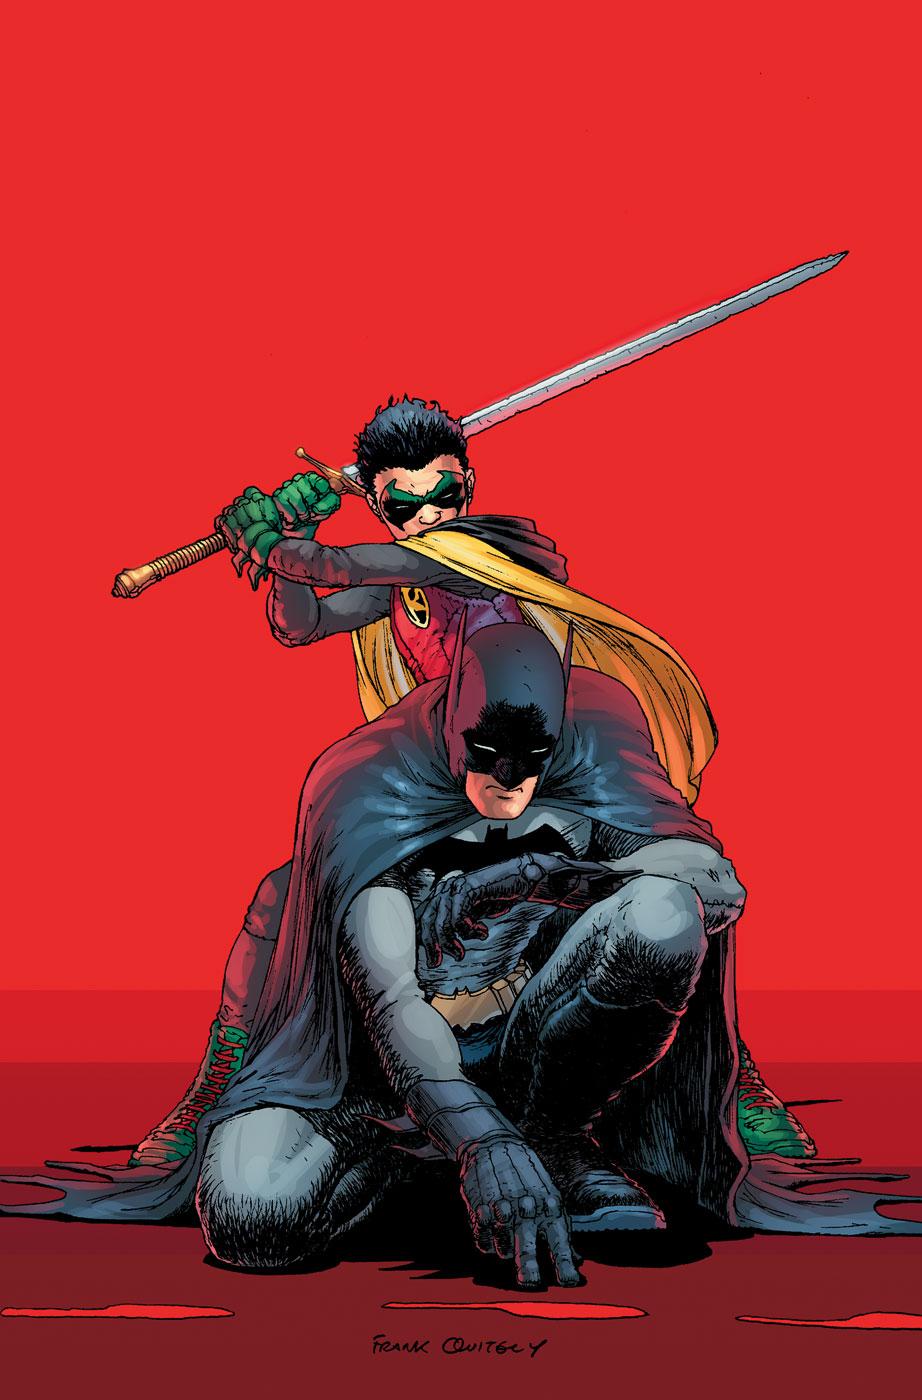 Grant Morrison's Run on Batman & Robin – Batman Reborn